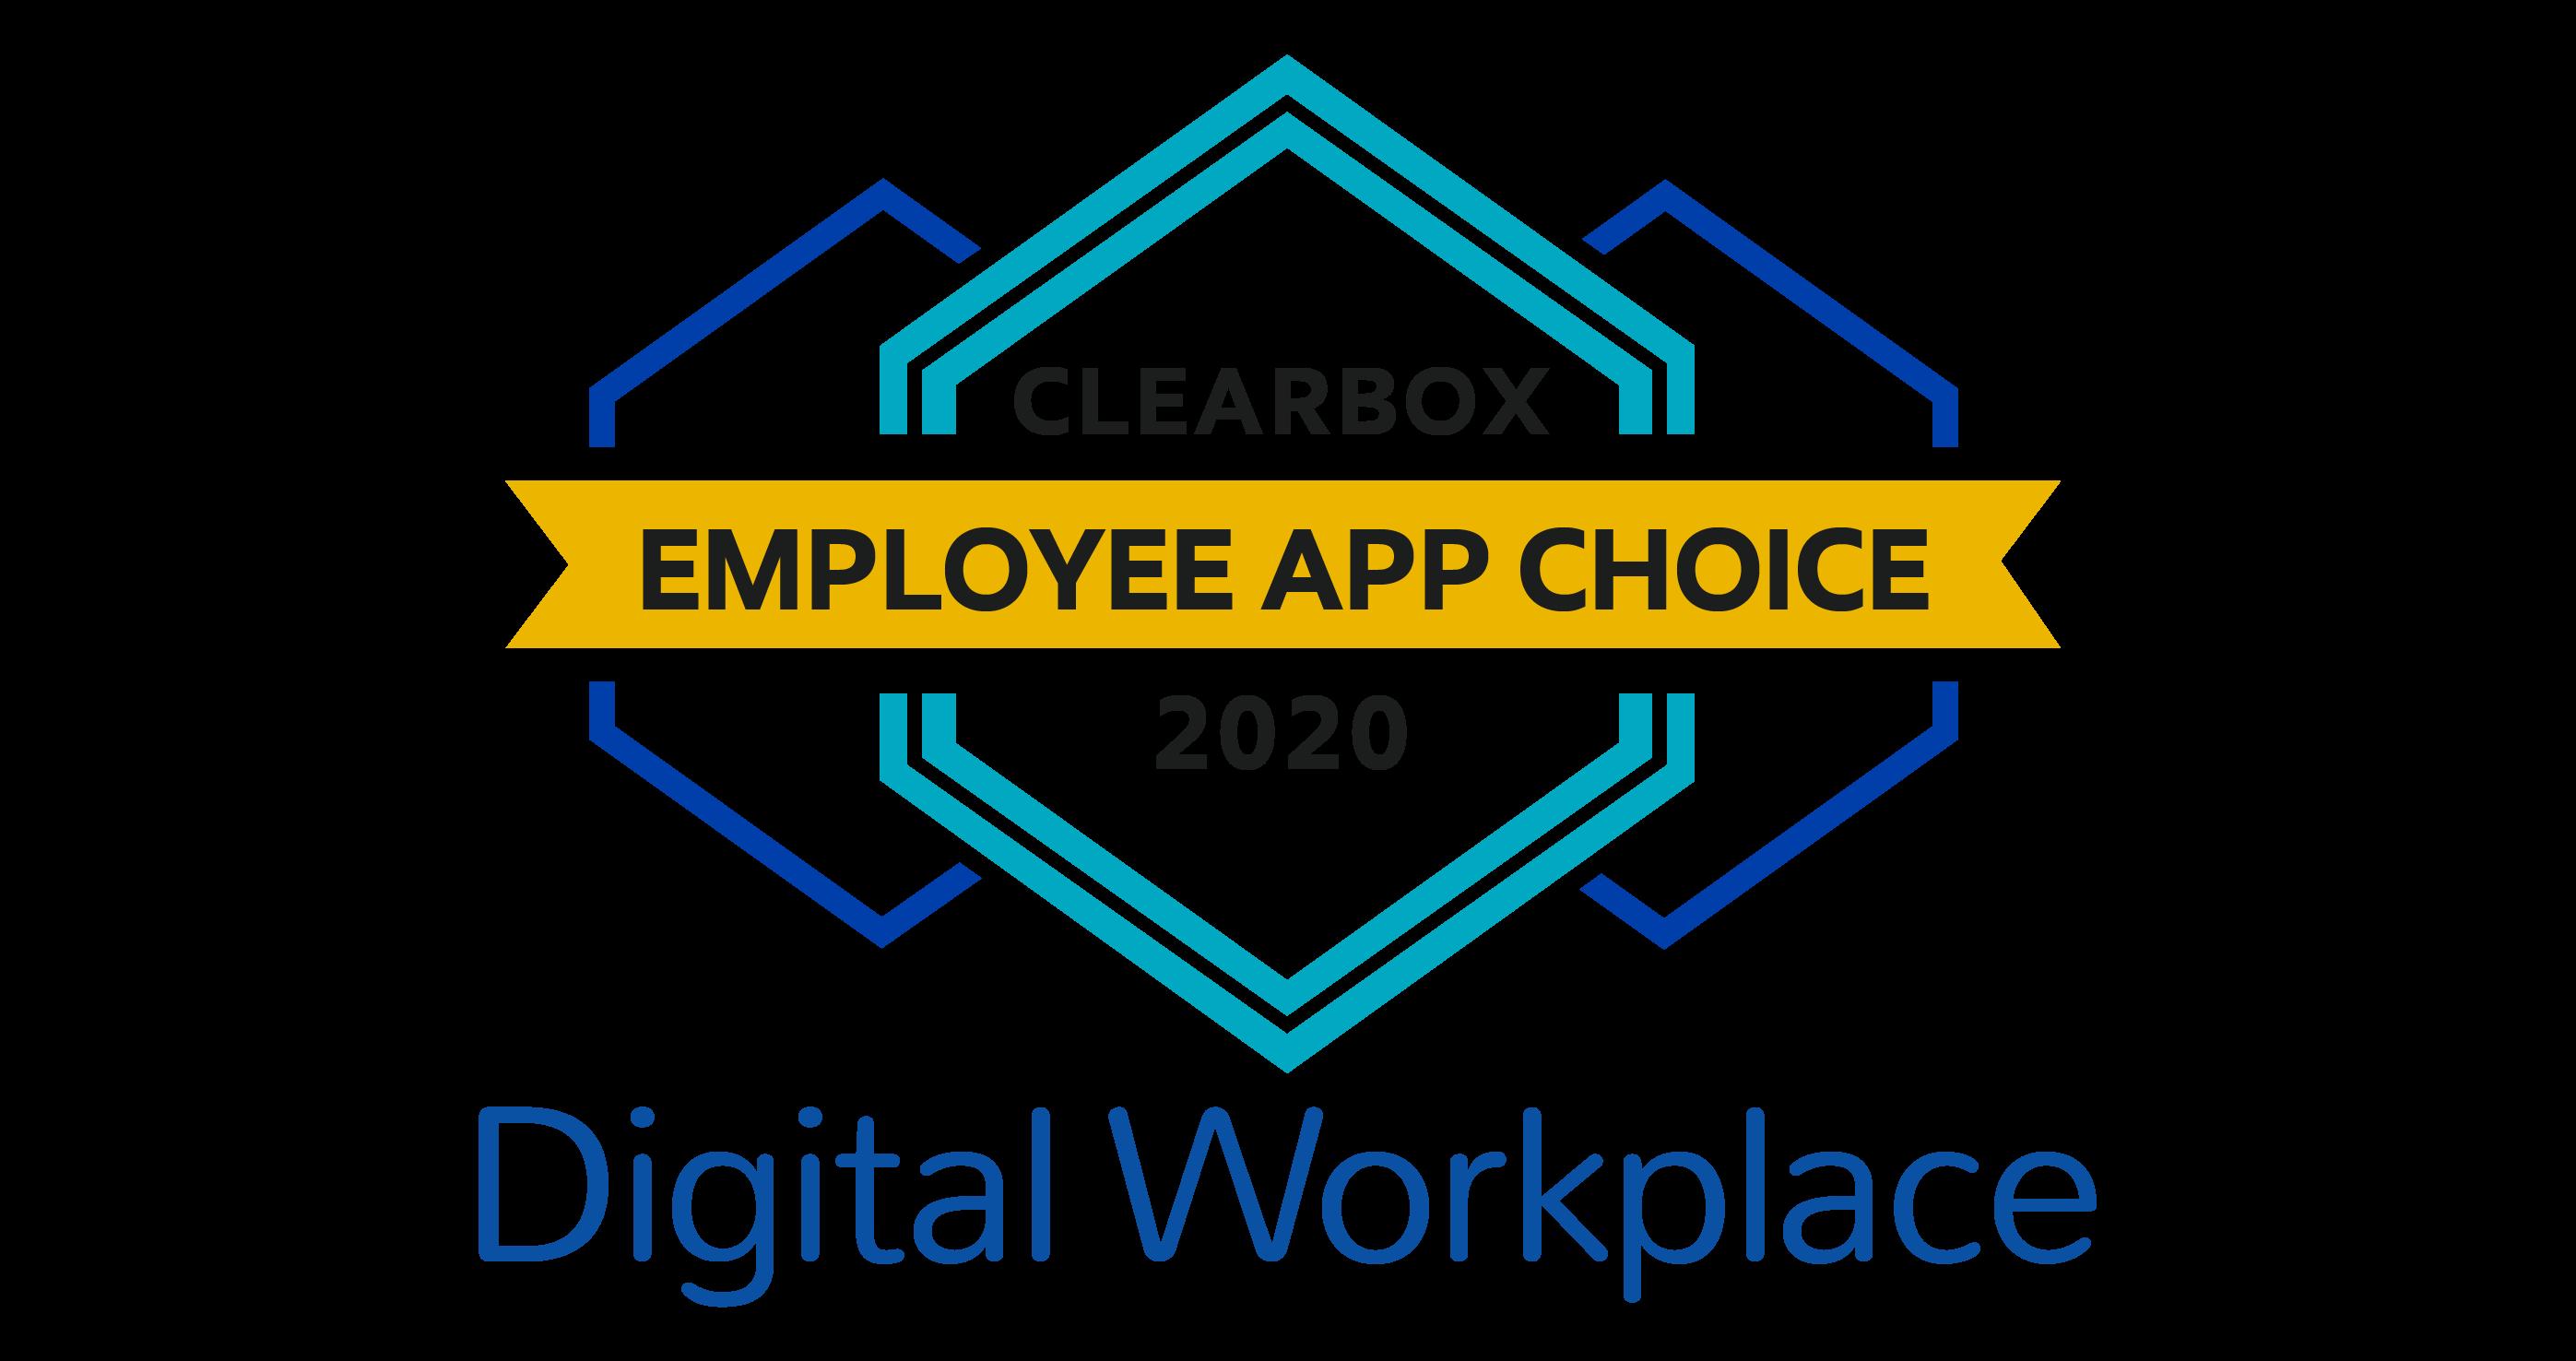 Employee app choice digital workplace 2020.